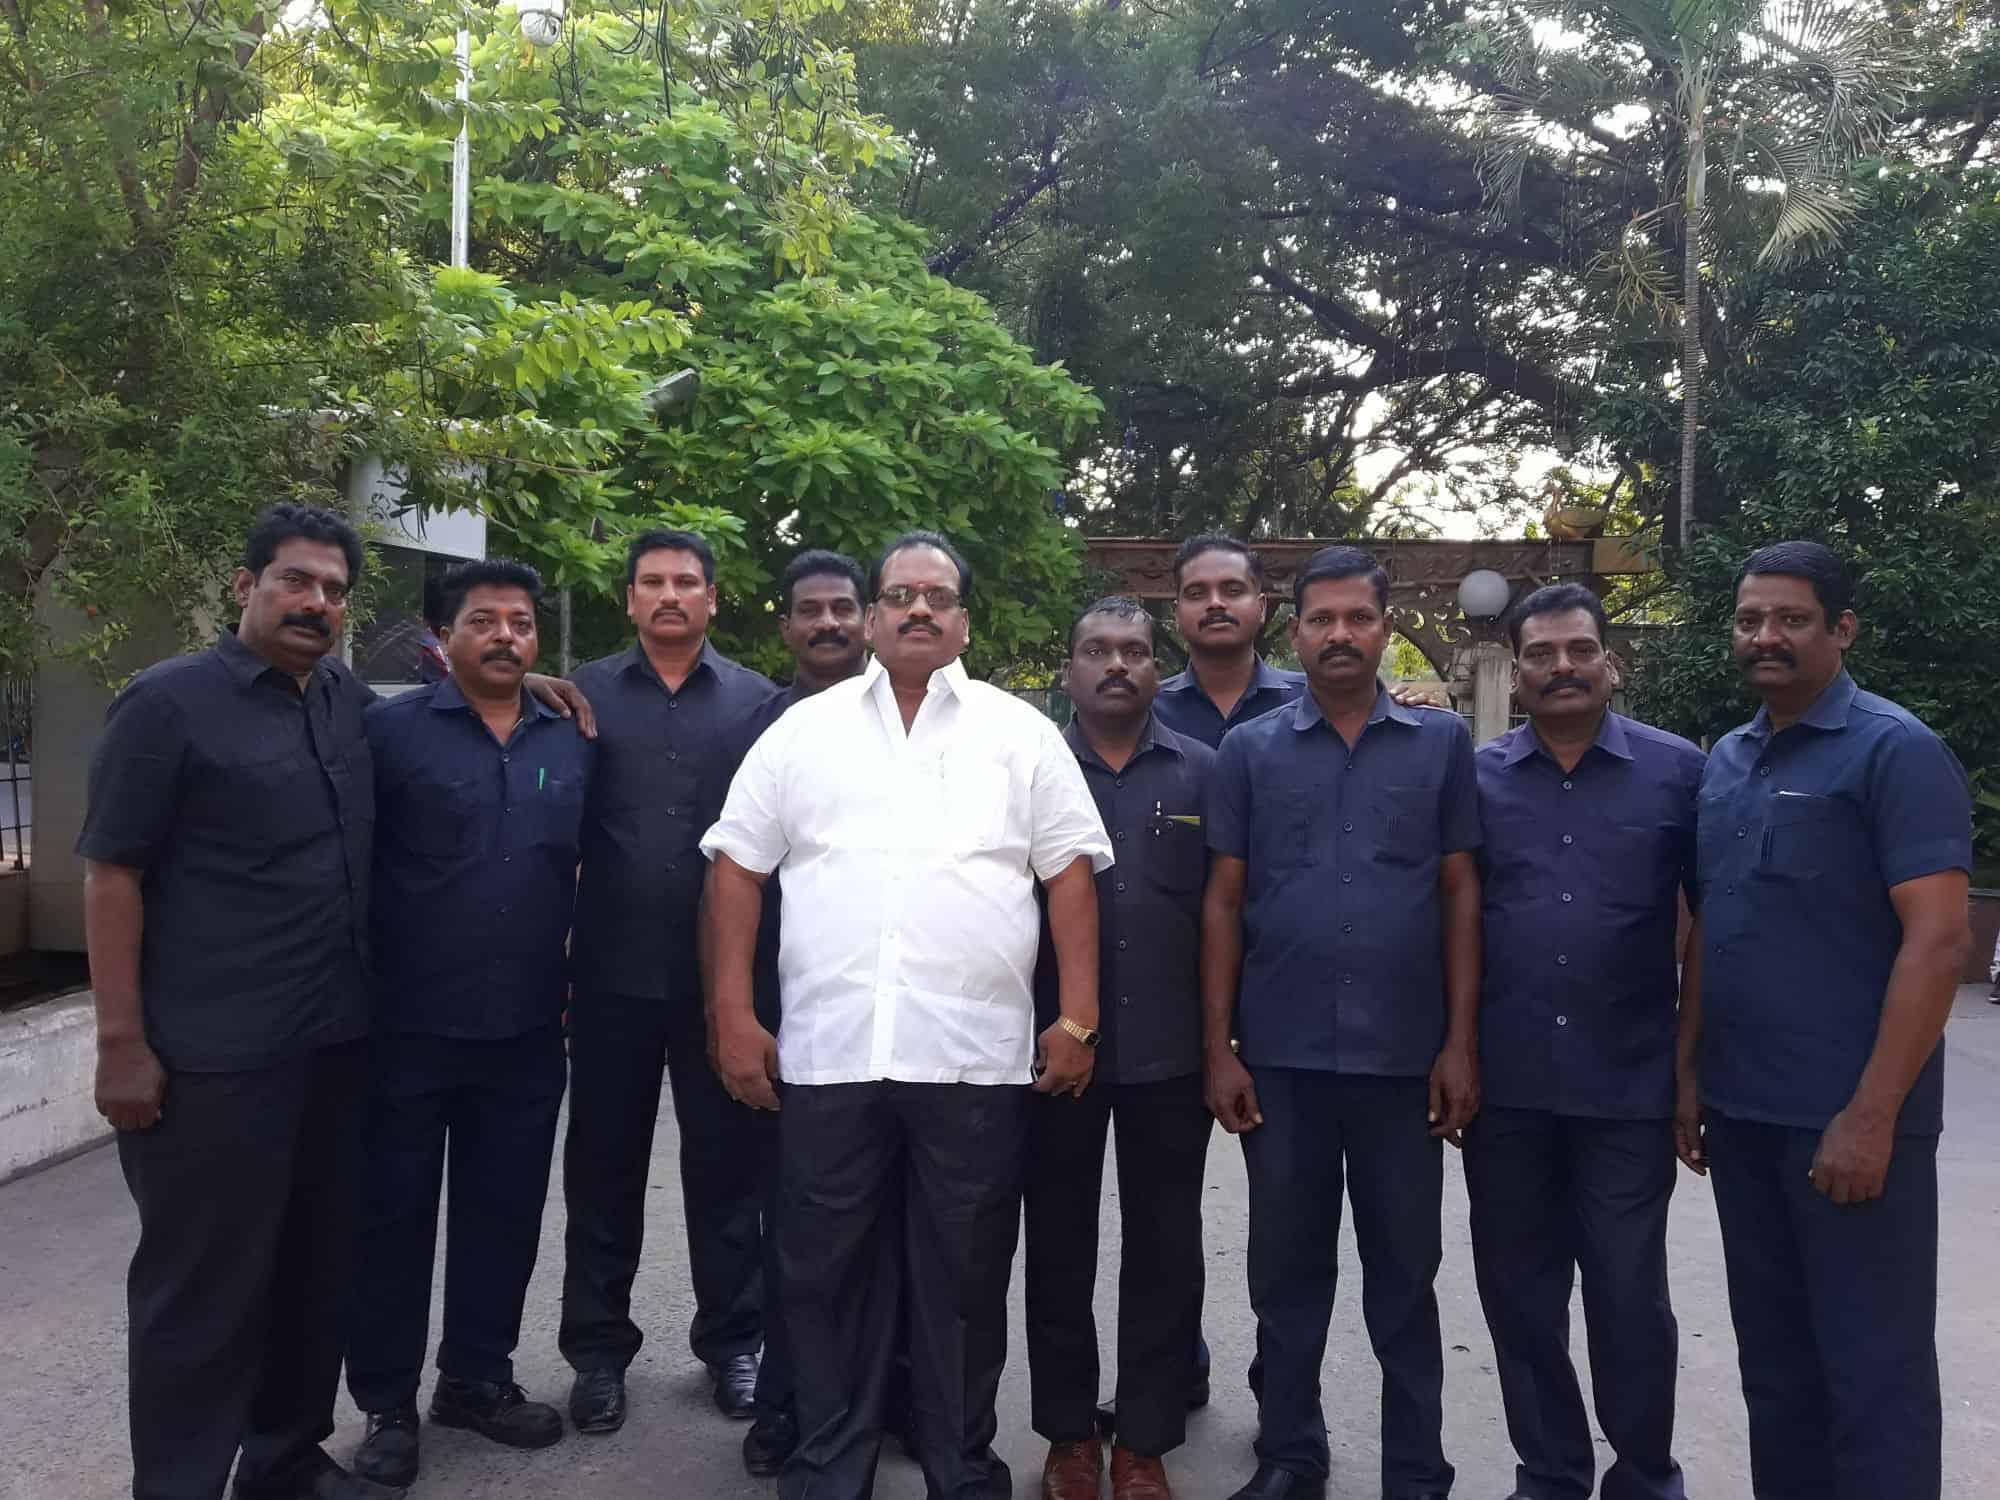 Nedunchezhiyan Bouncer Service, Egmore - Security Escort Services in  Chennai - Justdial